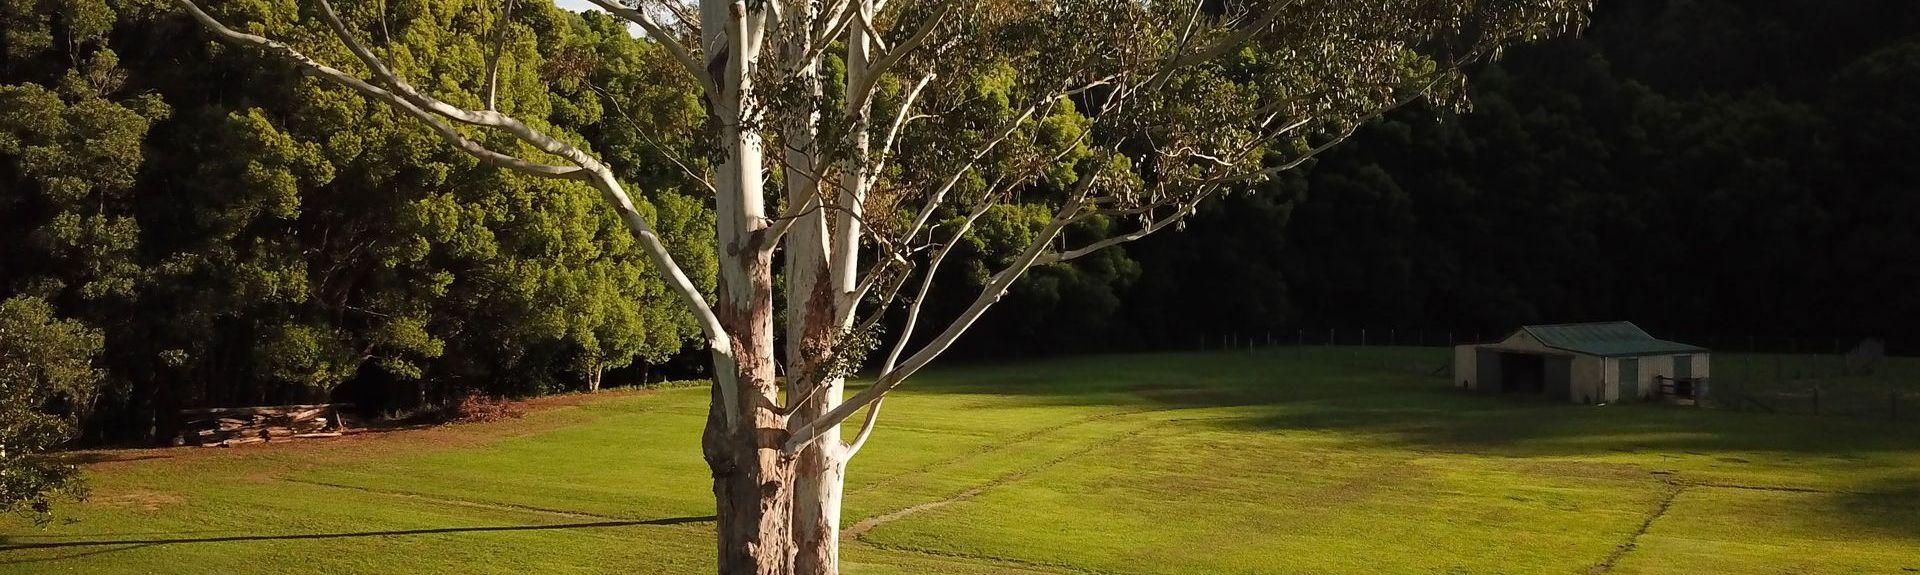 Cedar Creek, Tweed, NSW, Australia